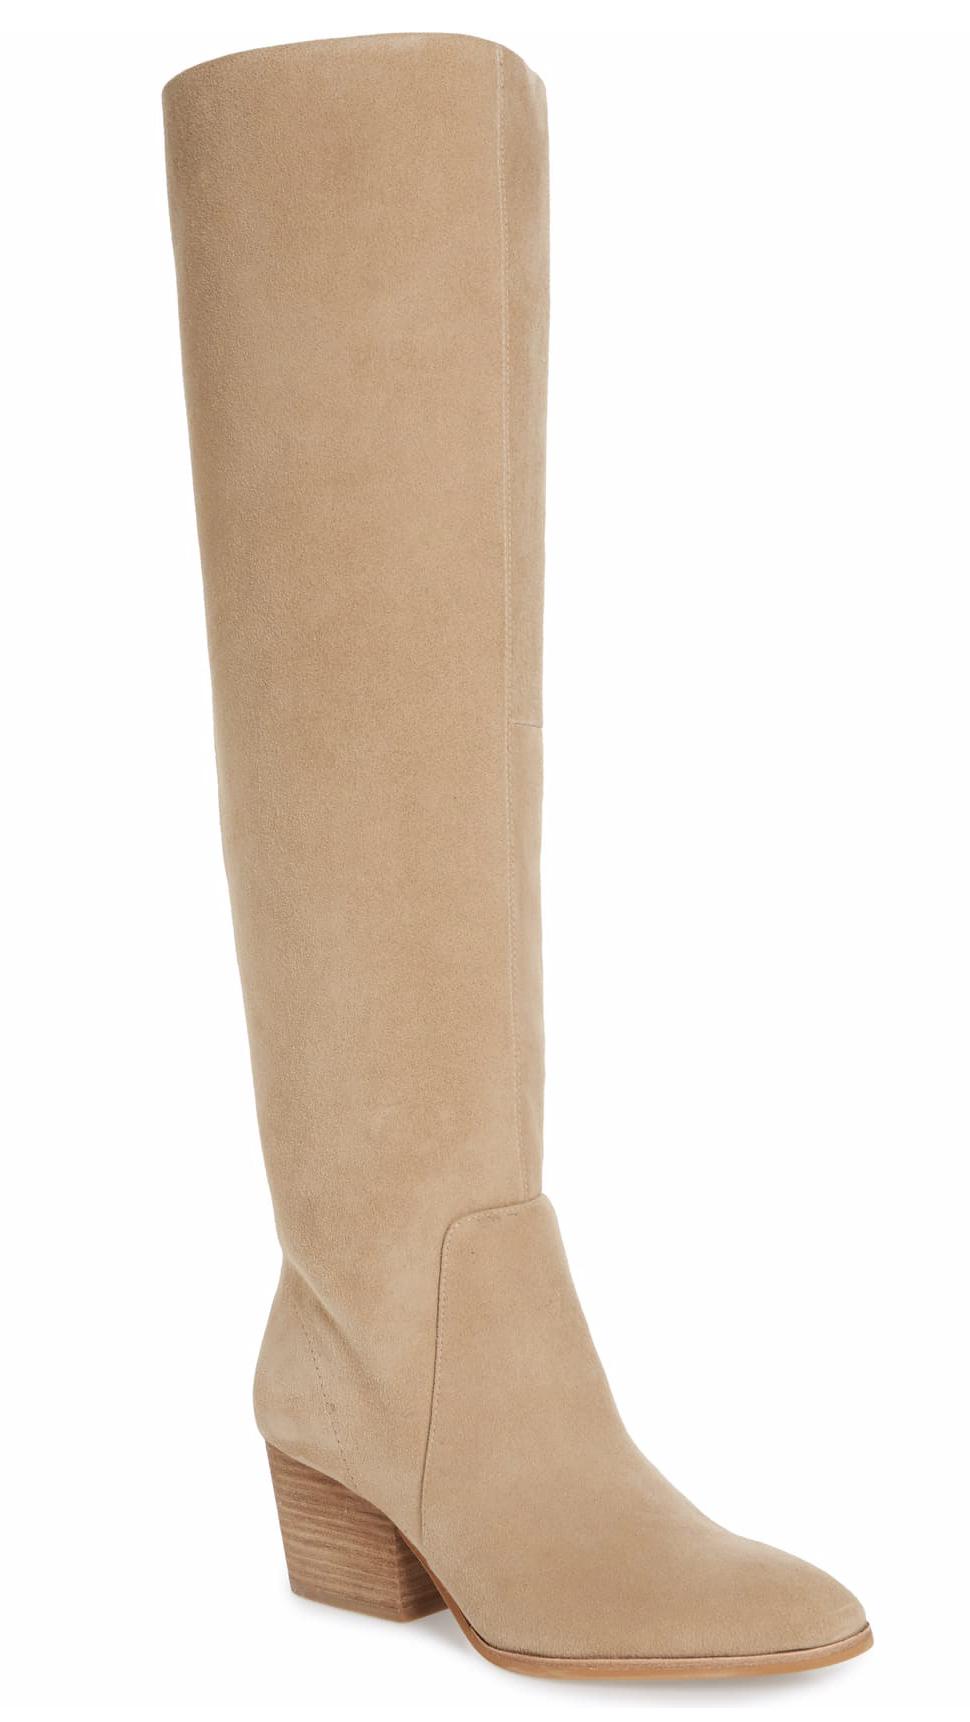 Vince Camuto Nestel Knee High Boot - $159.90